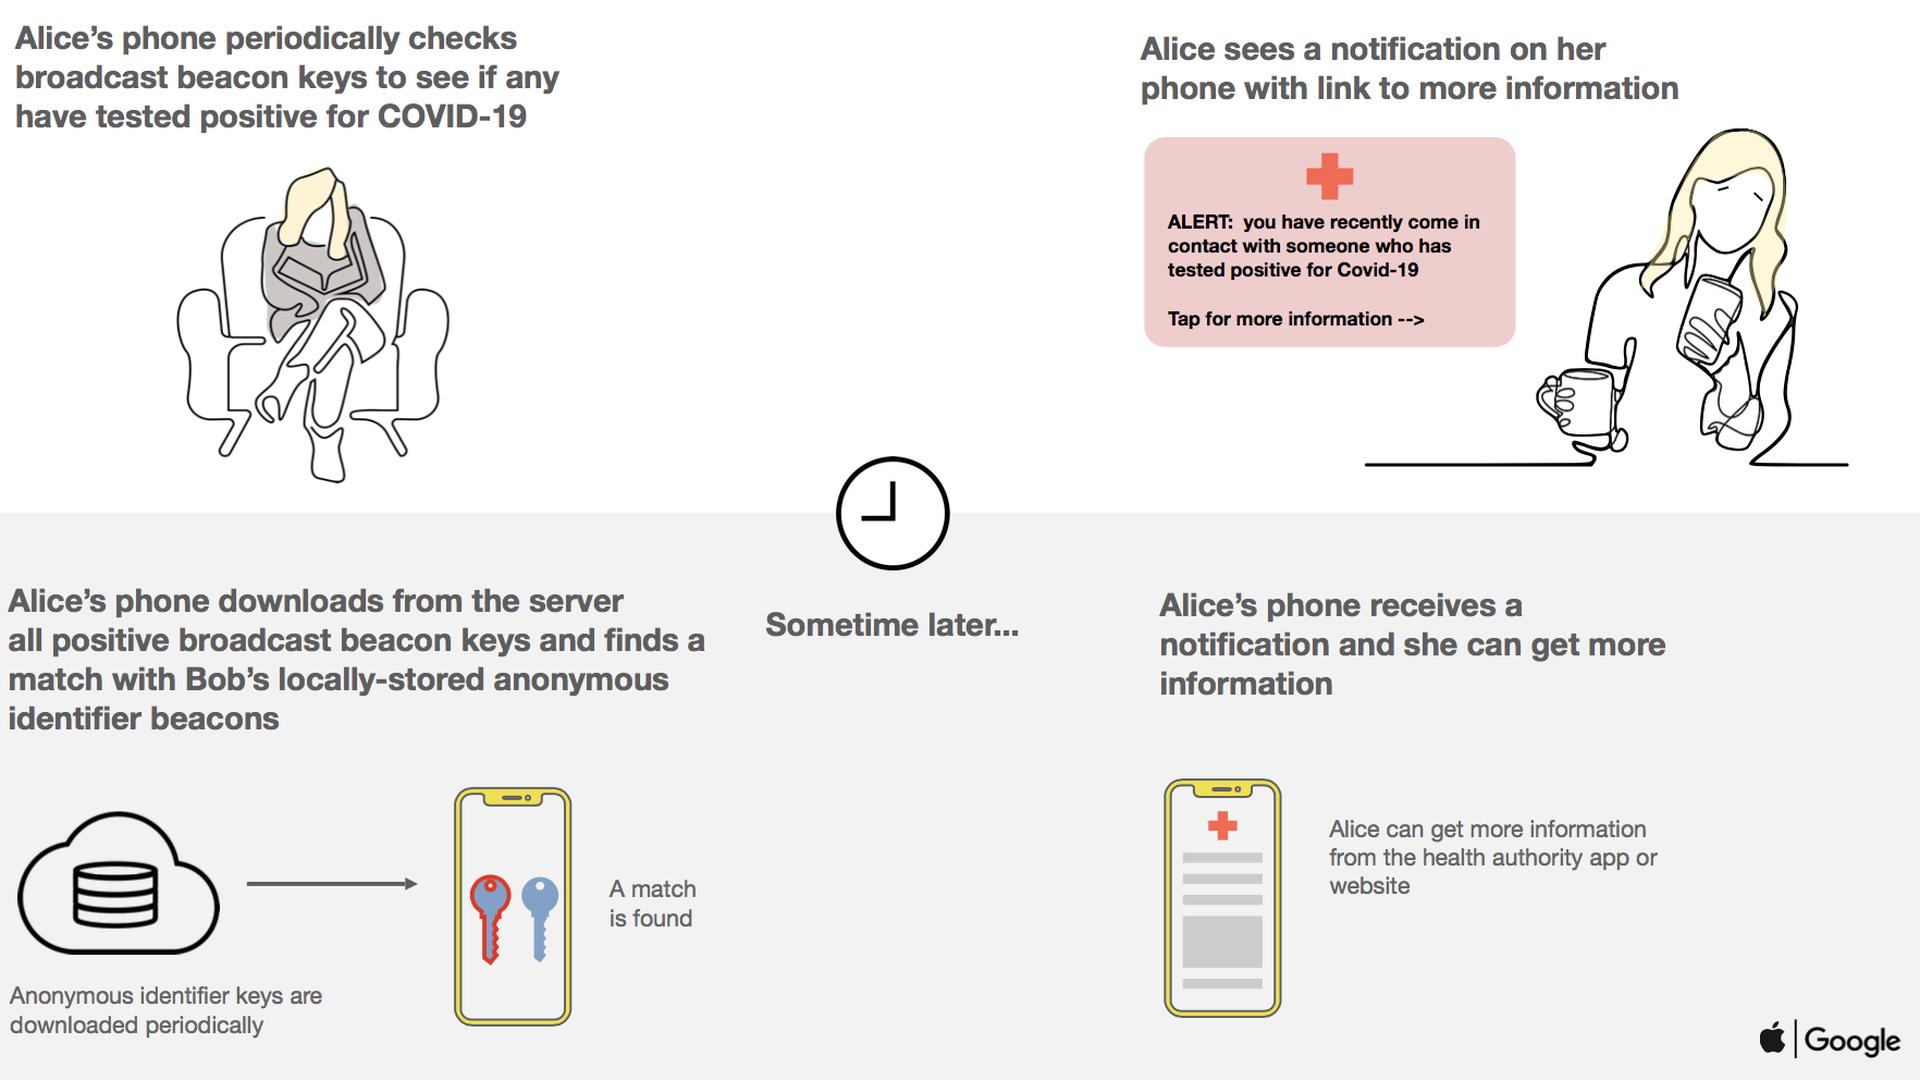 apple diagram app apple  google team up on coronavirus contact tracing axios  apple  google team up on coronavirus